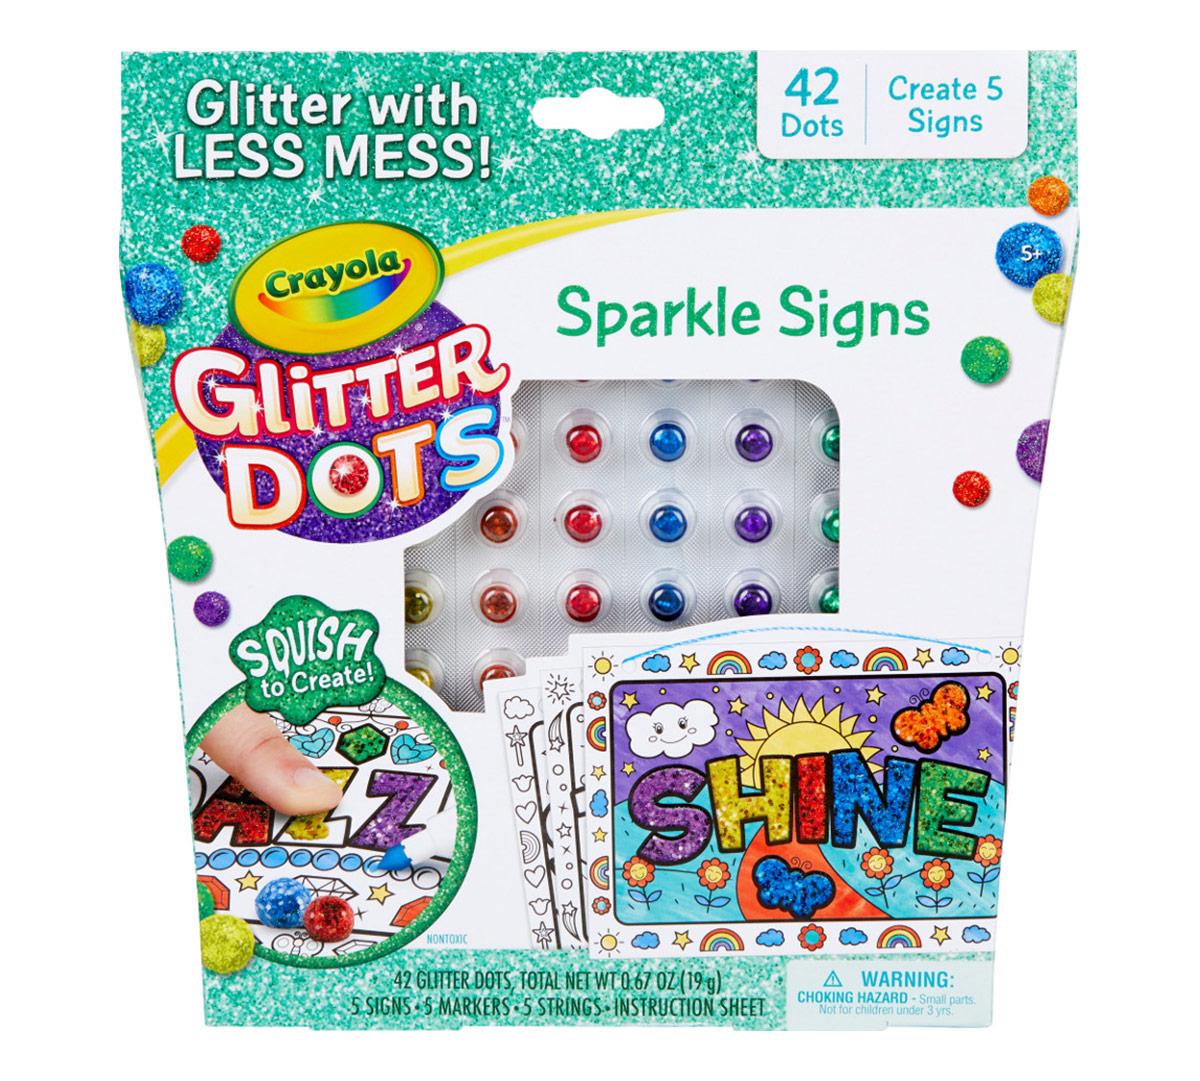 Glitter Dots Sparkle Signs Glitter Craft Kit Crayola